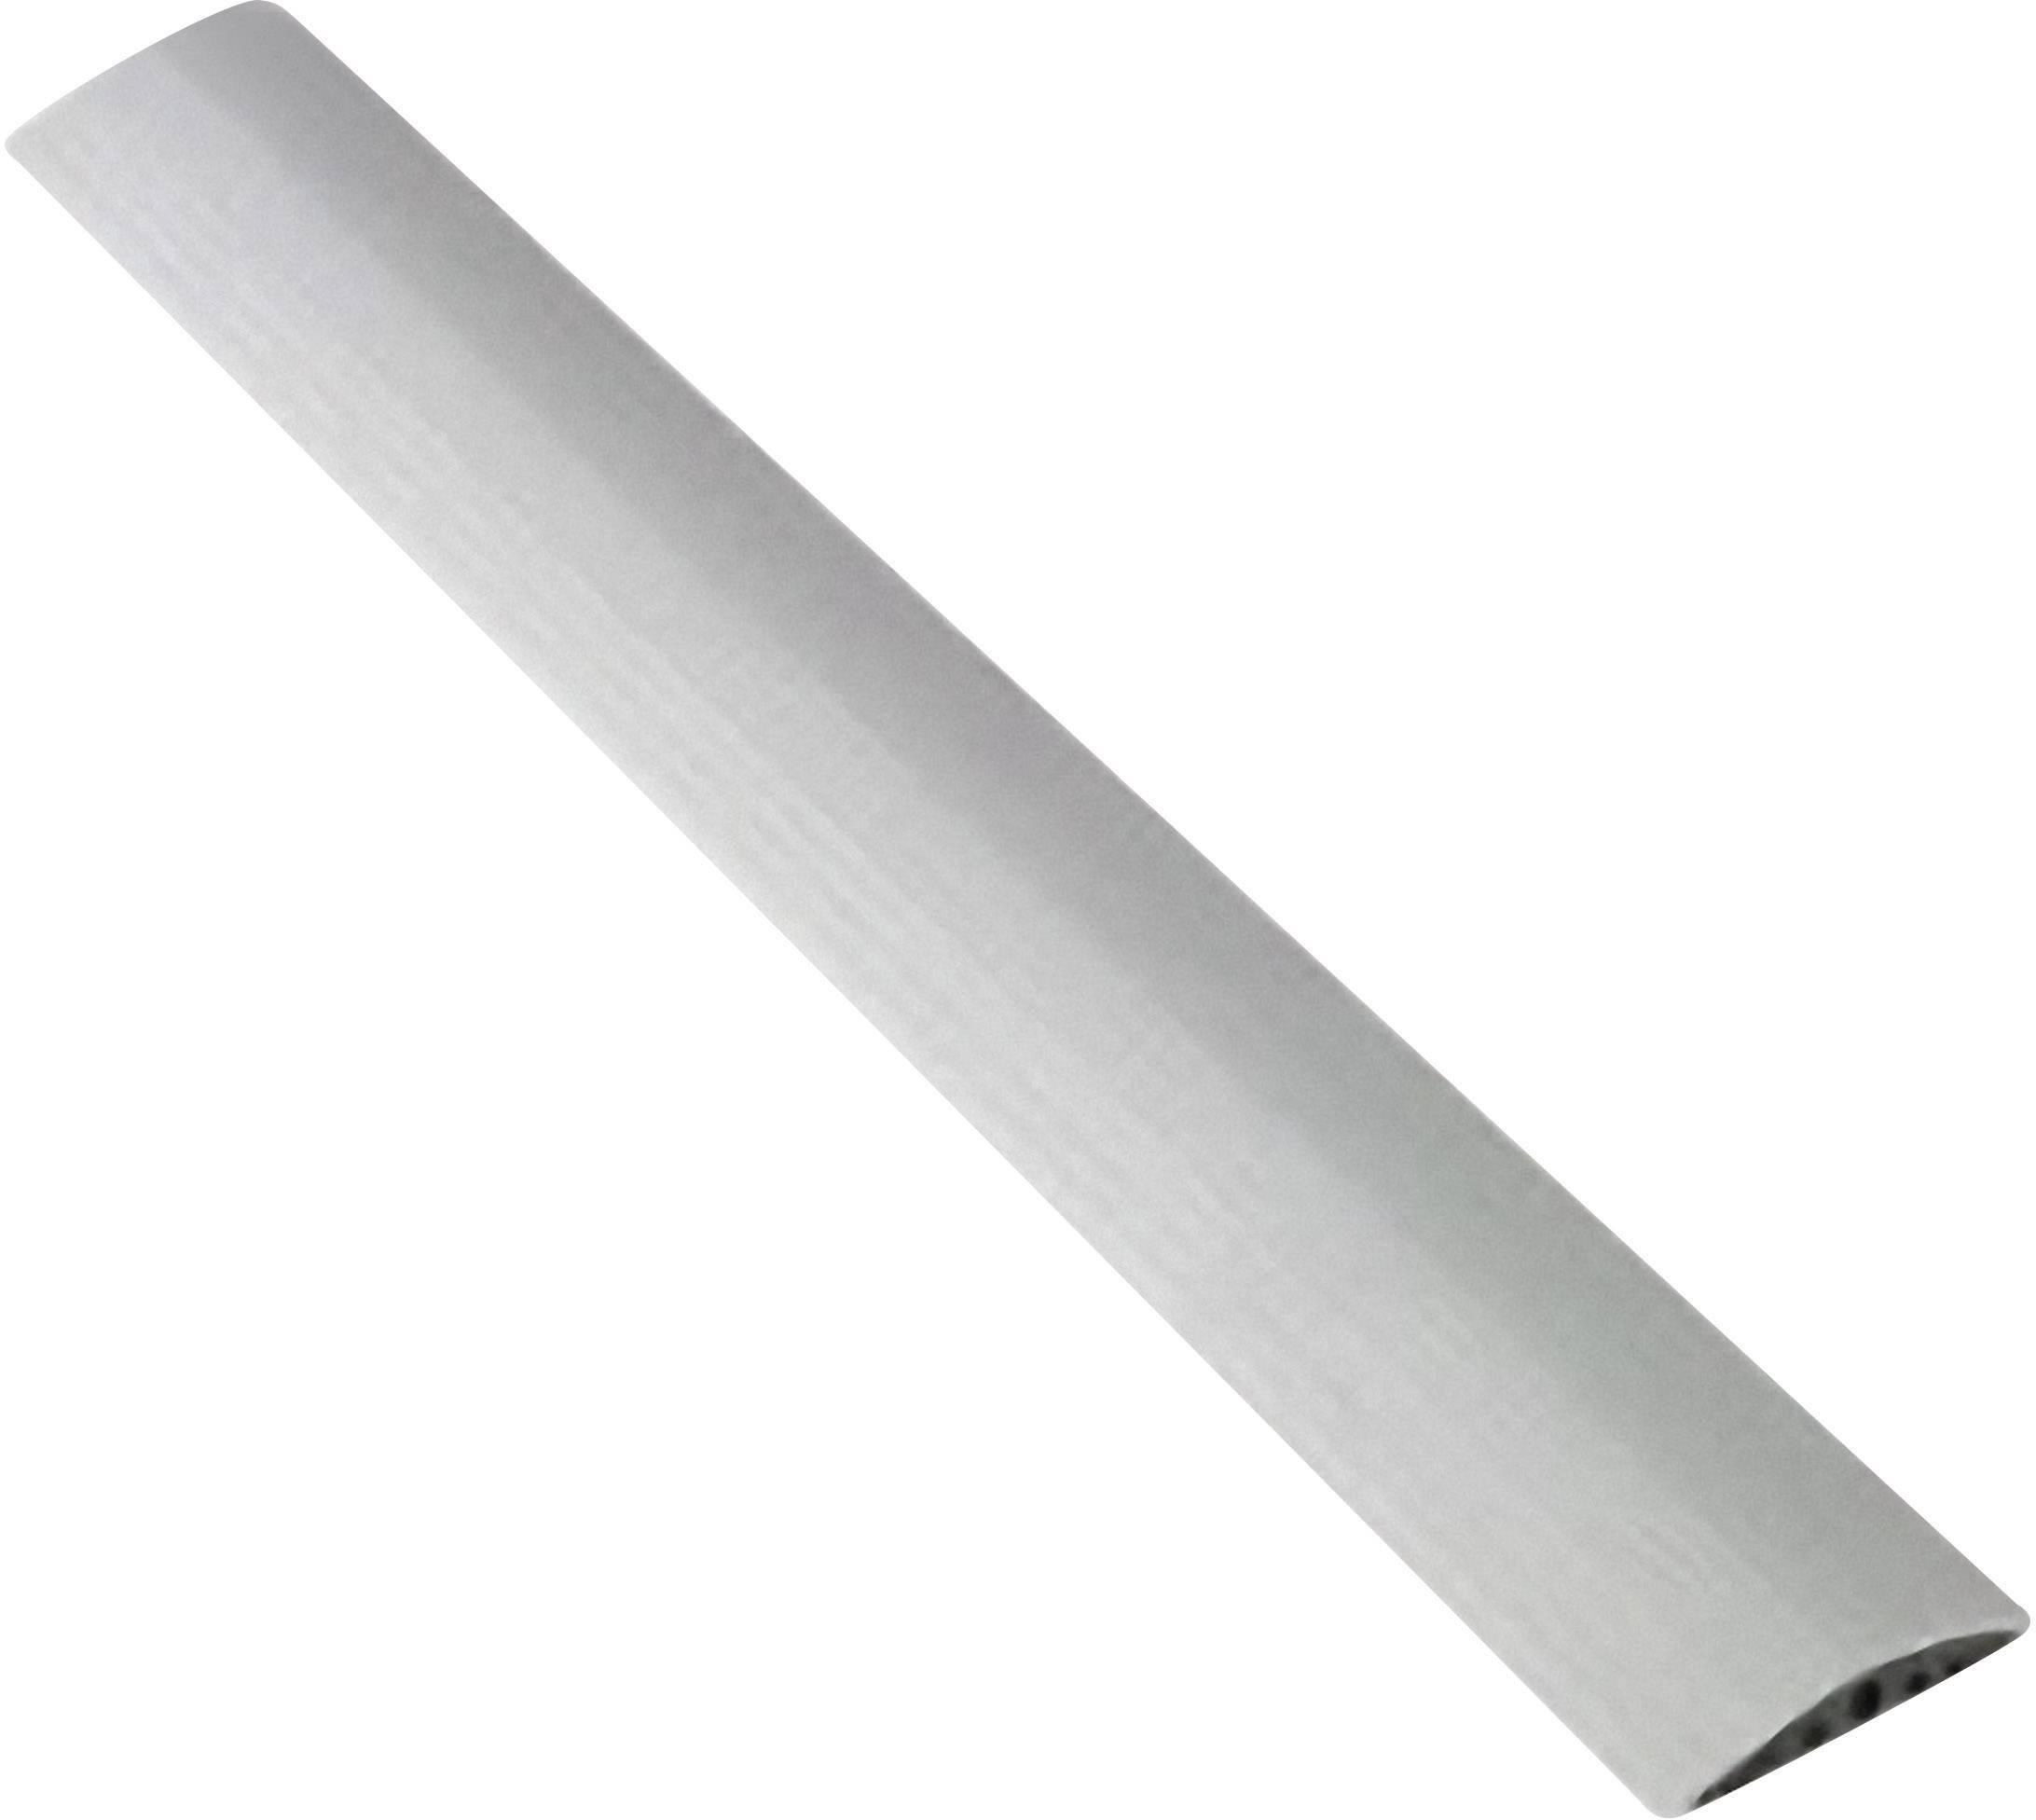 Káblový mostík Serpa 5.01022.7042 B9, (d x š) 1.5 m x 95 mm, svetlosivá, 1 ks